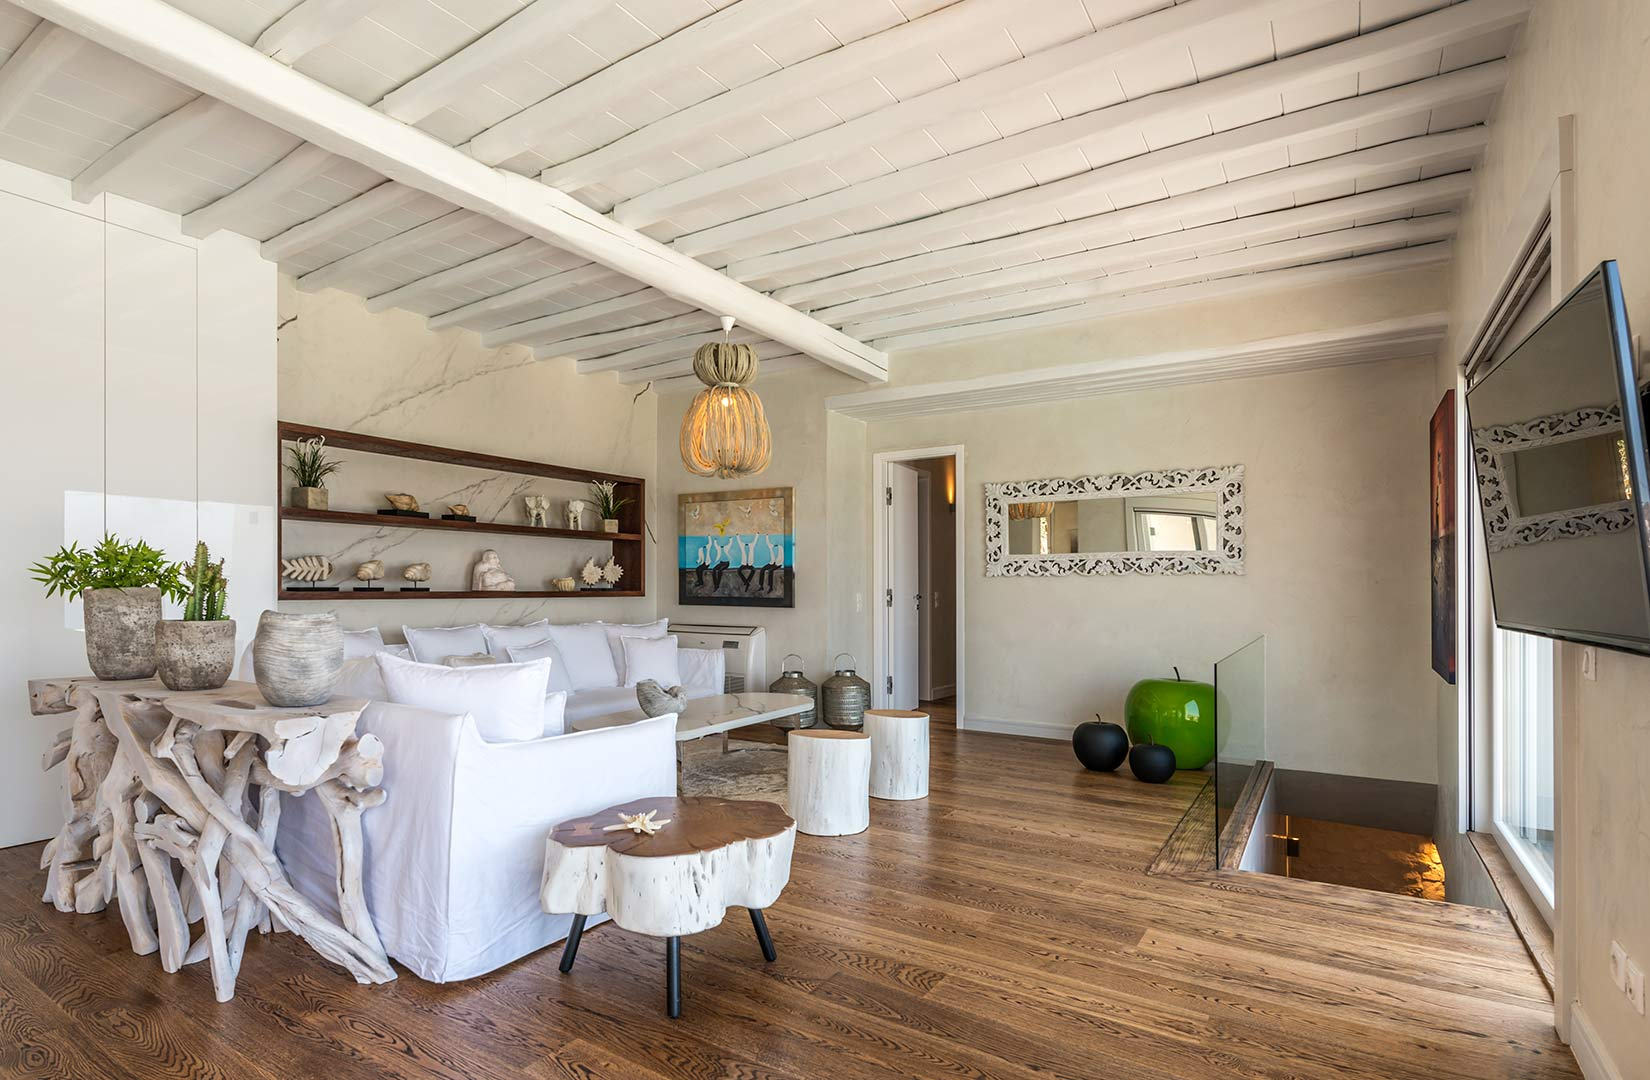 Mykonos, Greece: Living room